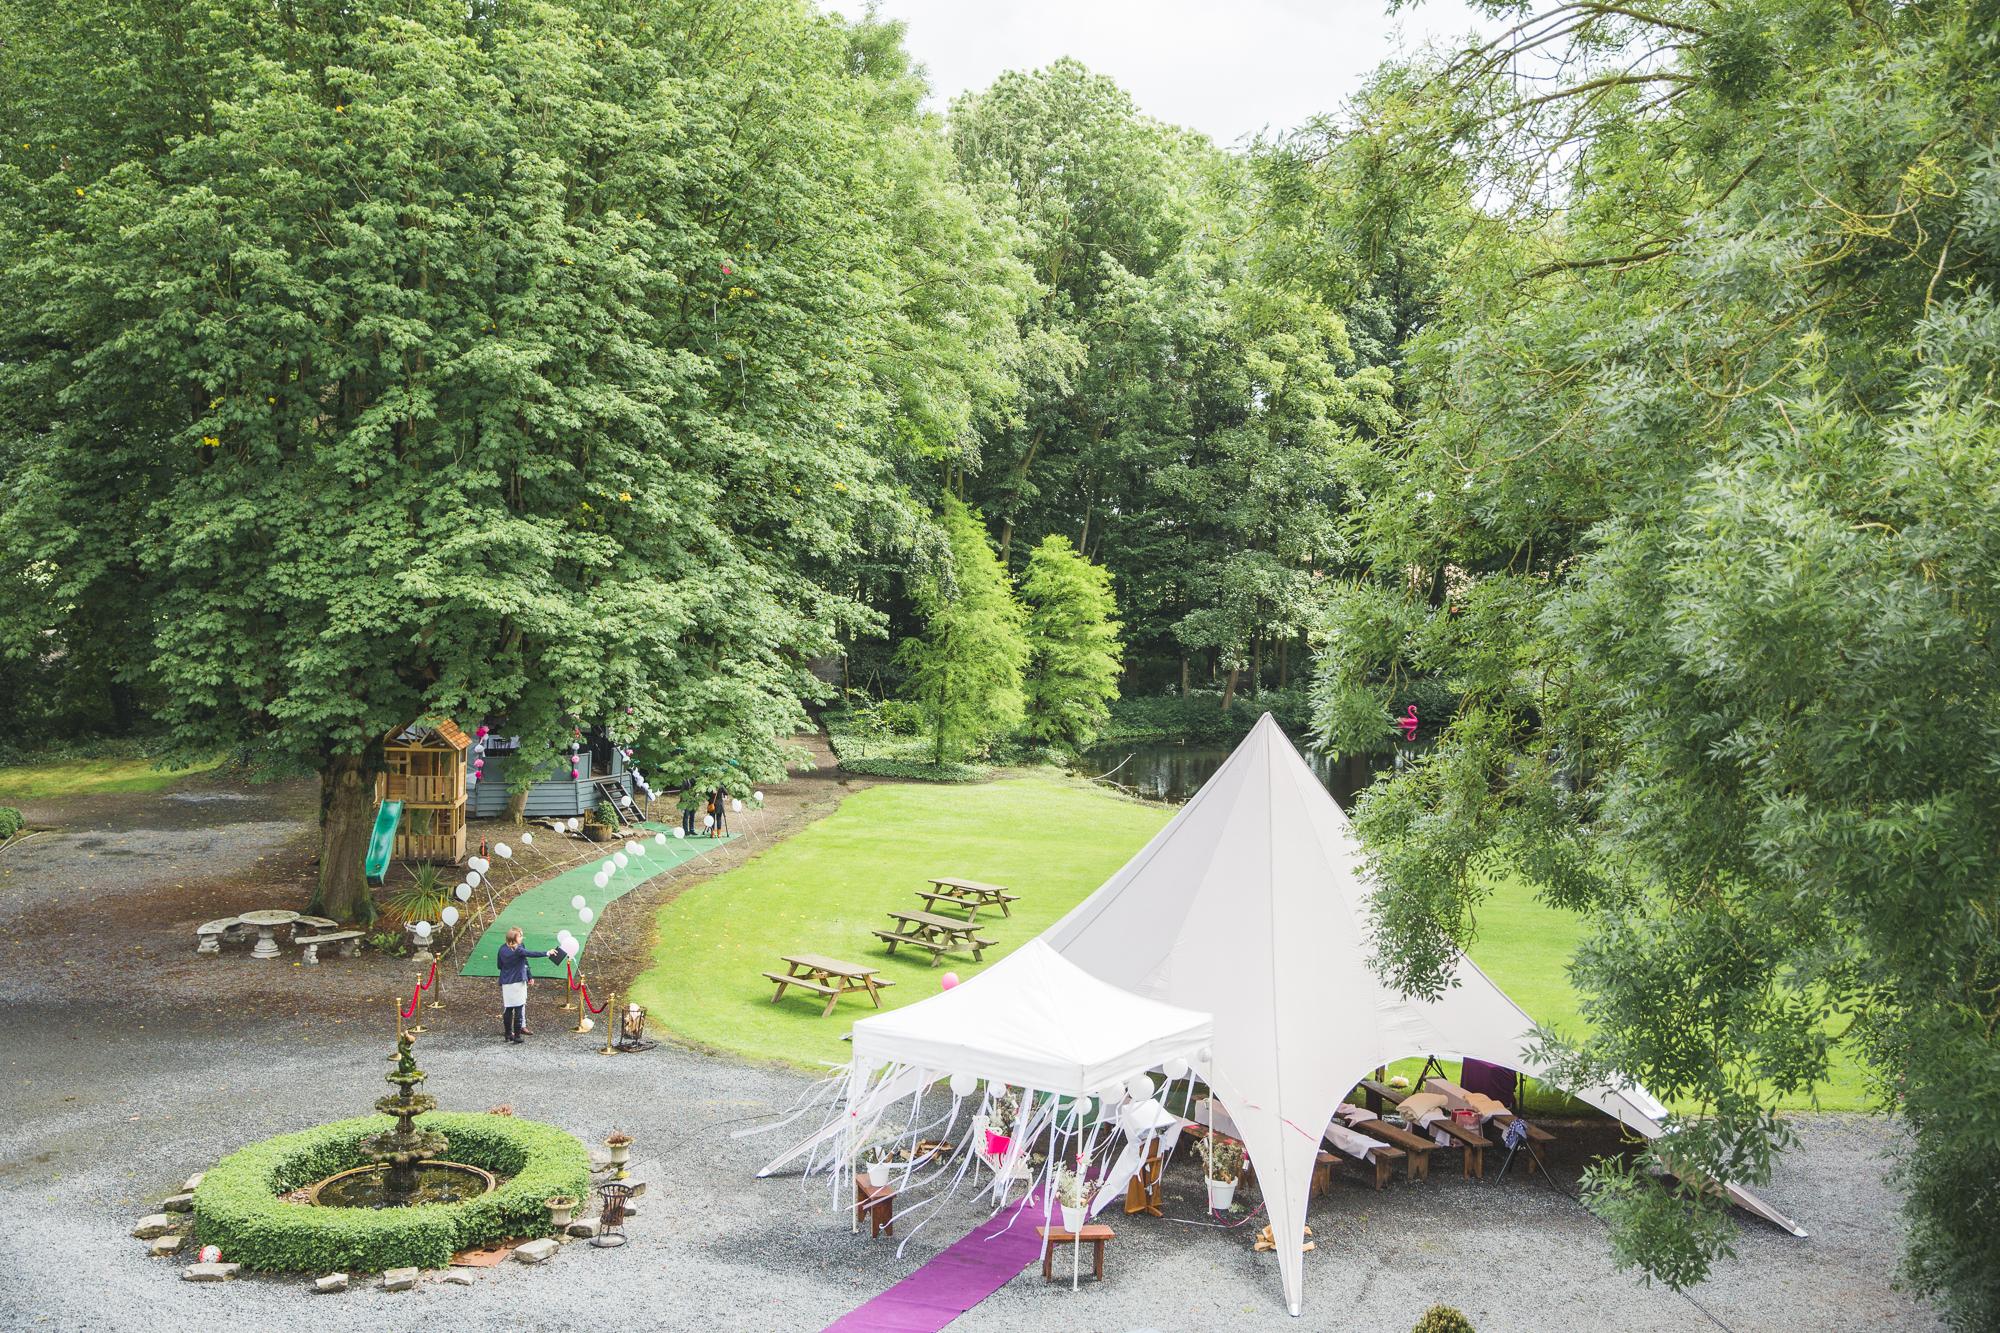 Bruiloft Kasteel Ter Leyen België